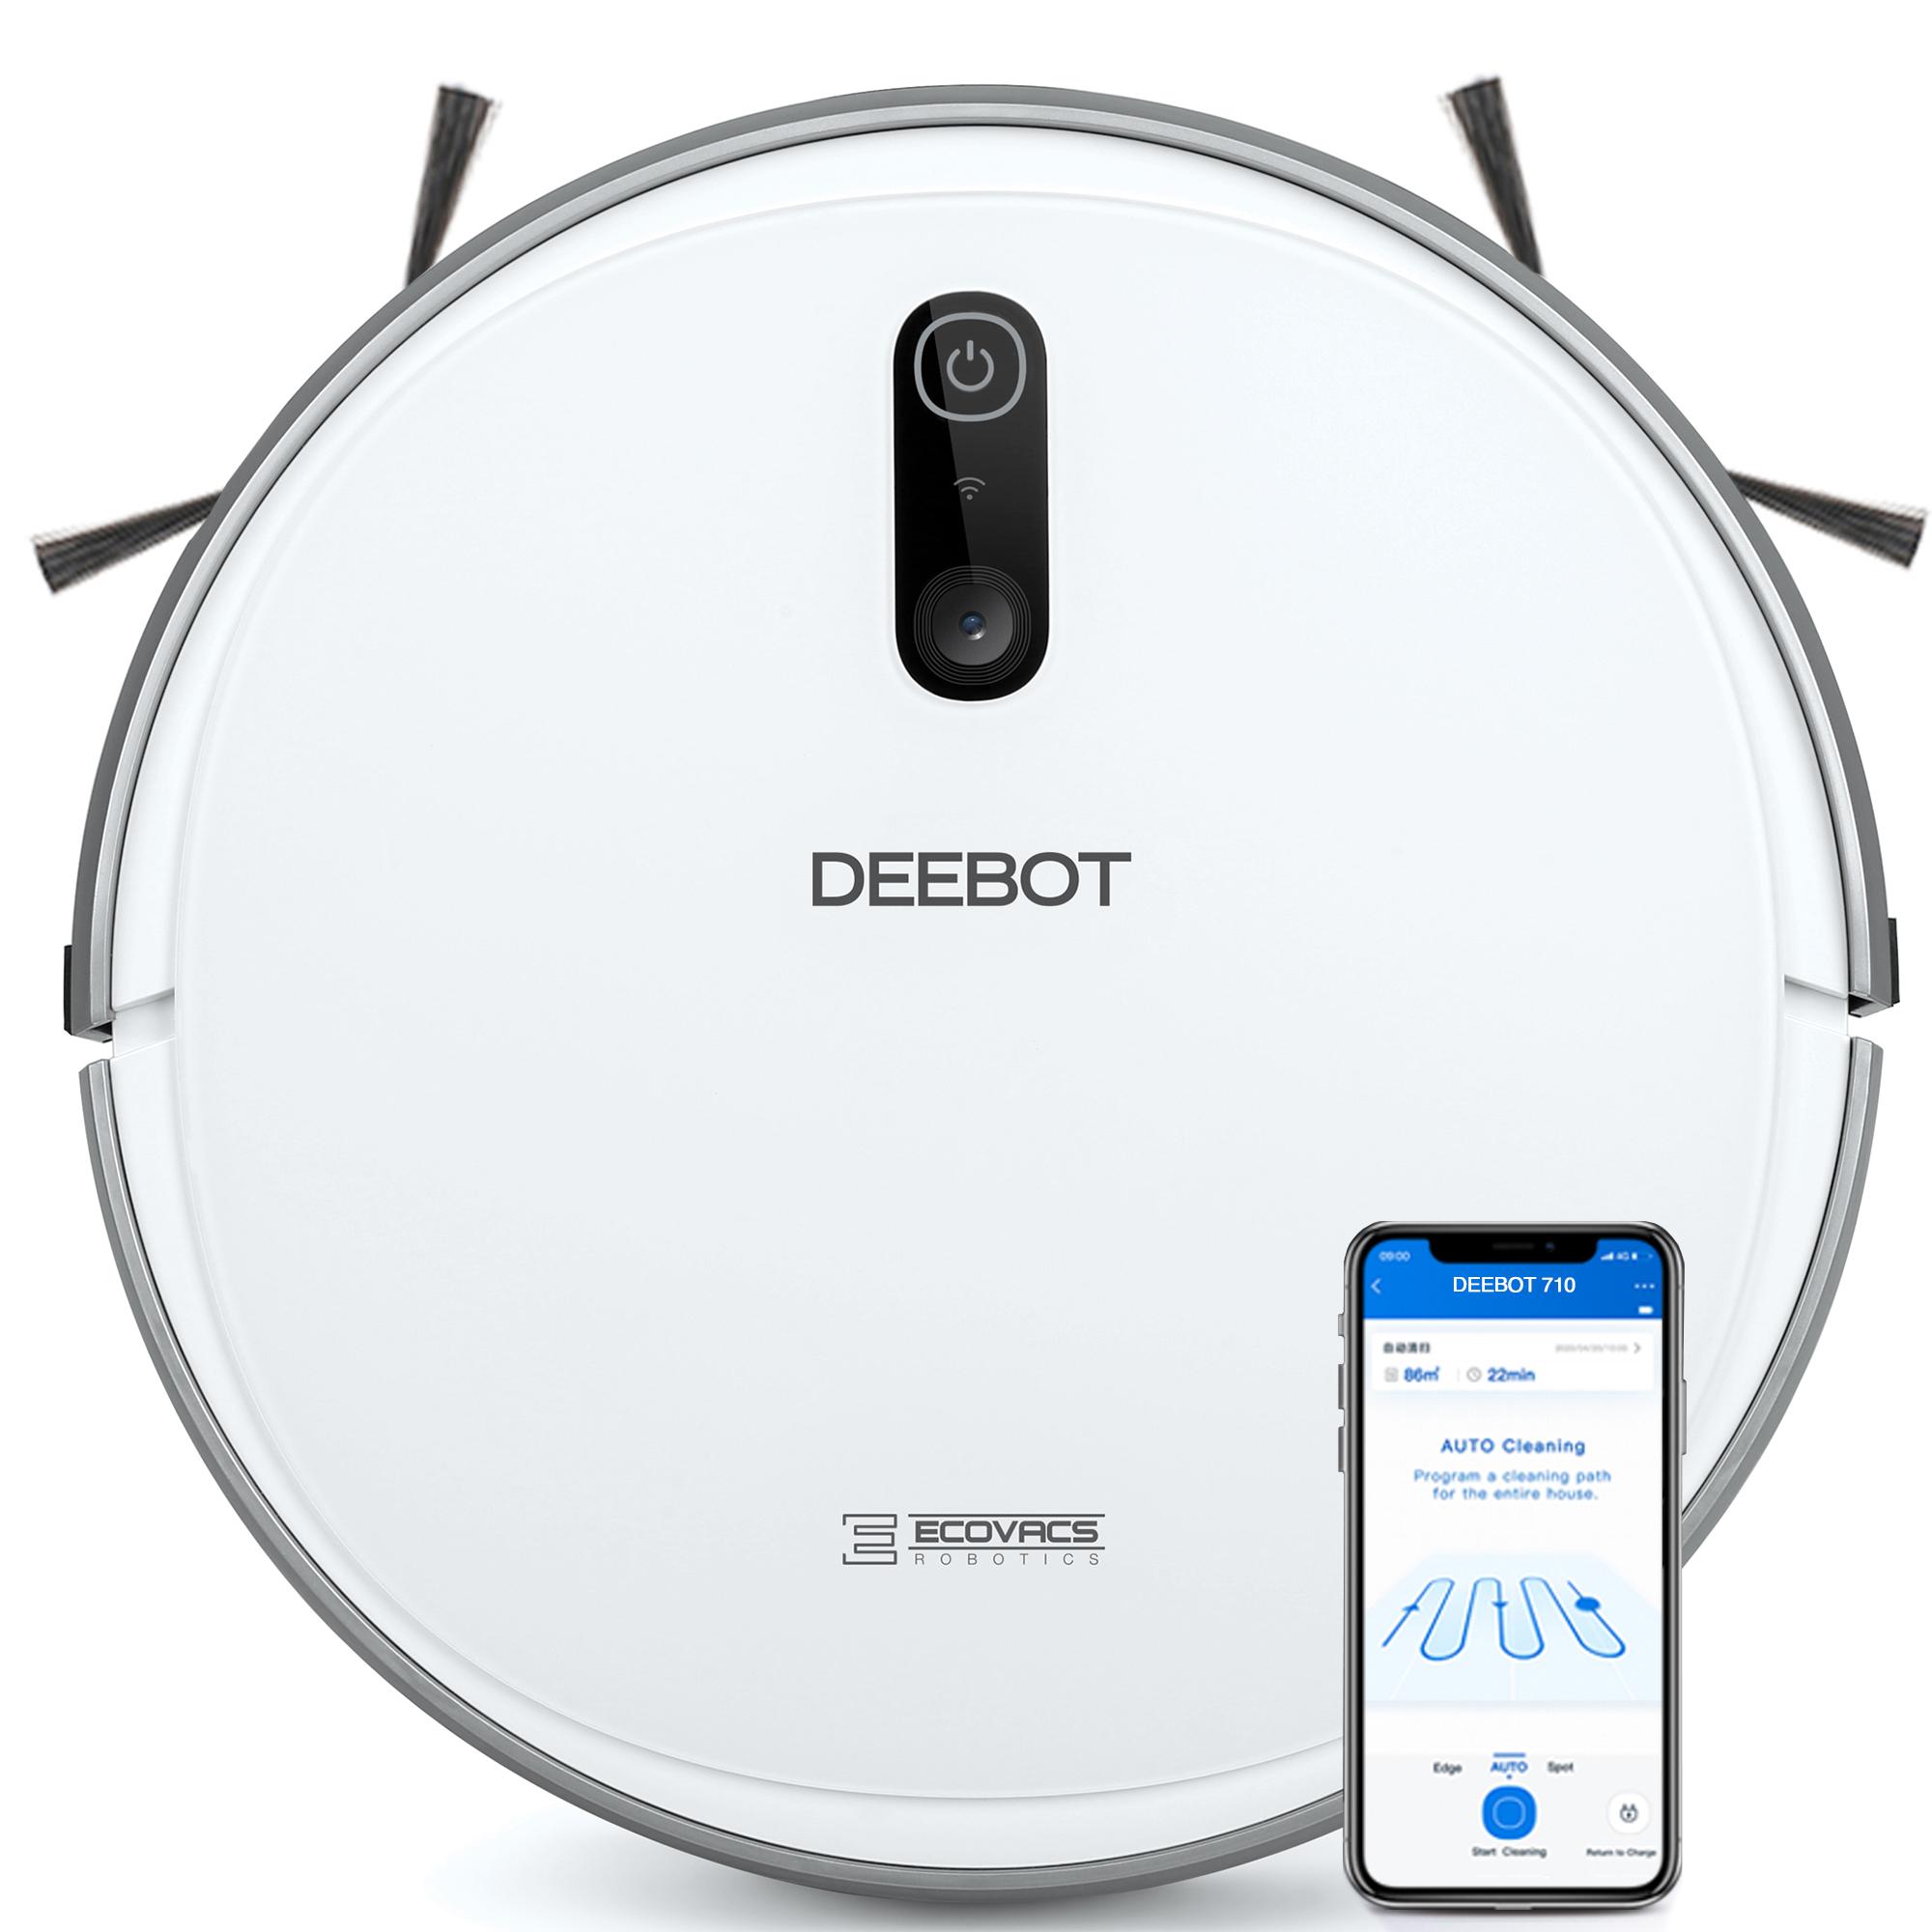 Ecovacs Deebot 710 Robot Vacuum Cleaner - Smart Navi 2.0, 110min Runtime